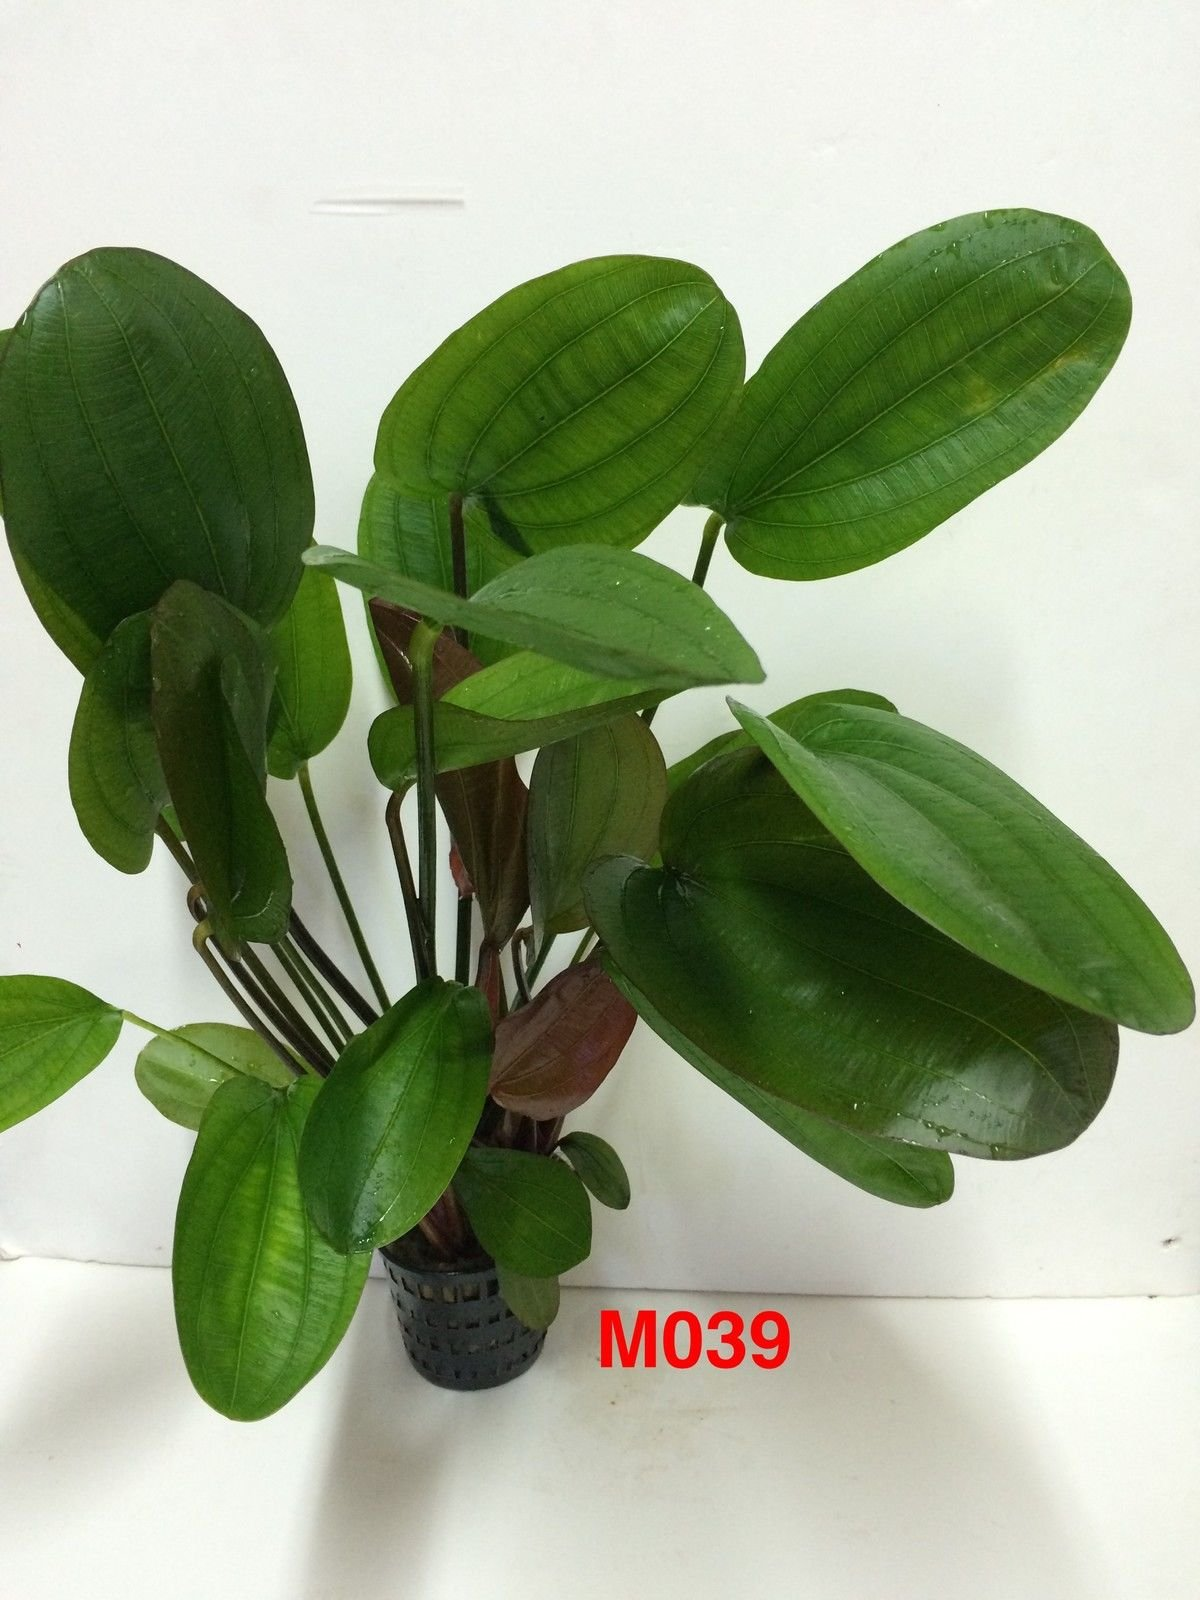 Echinodorus 'Big Bear' Mother Pot Live Aquatic Fresh Water Plant M039 jLG -133